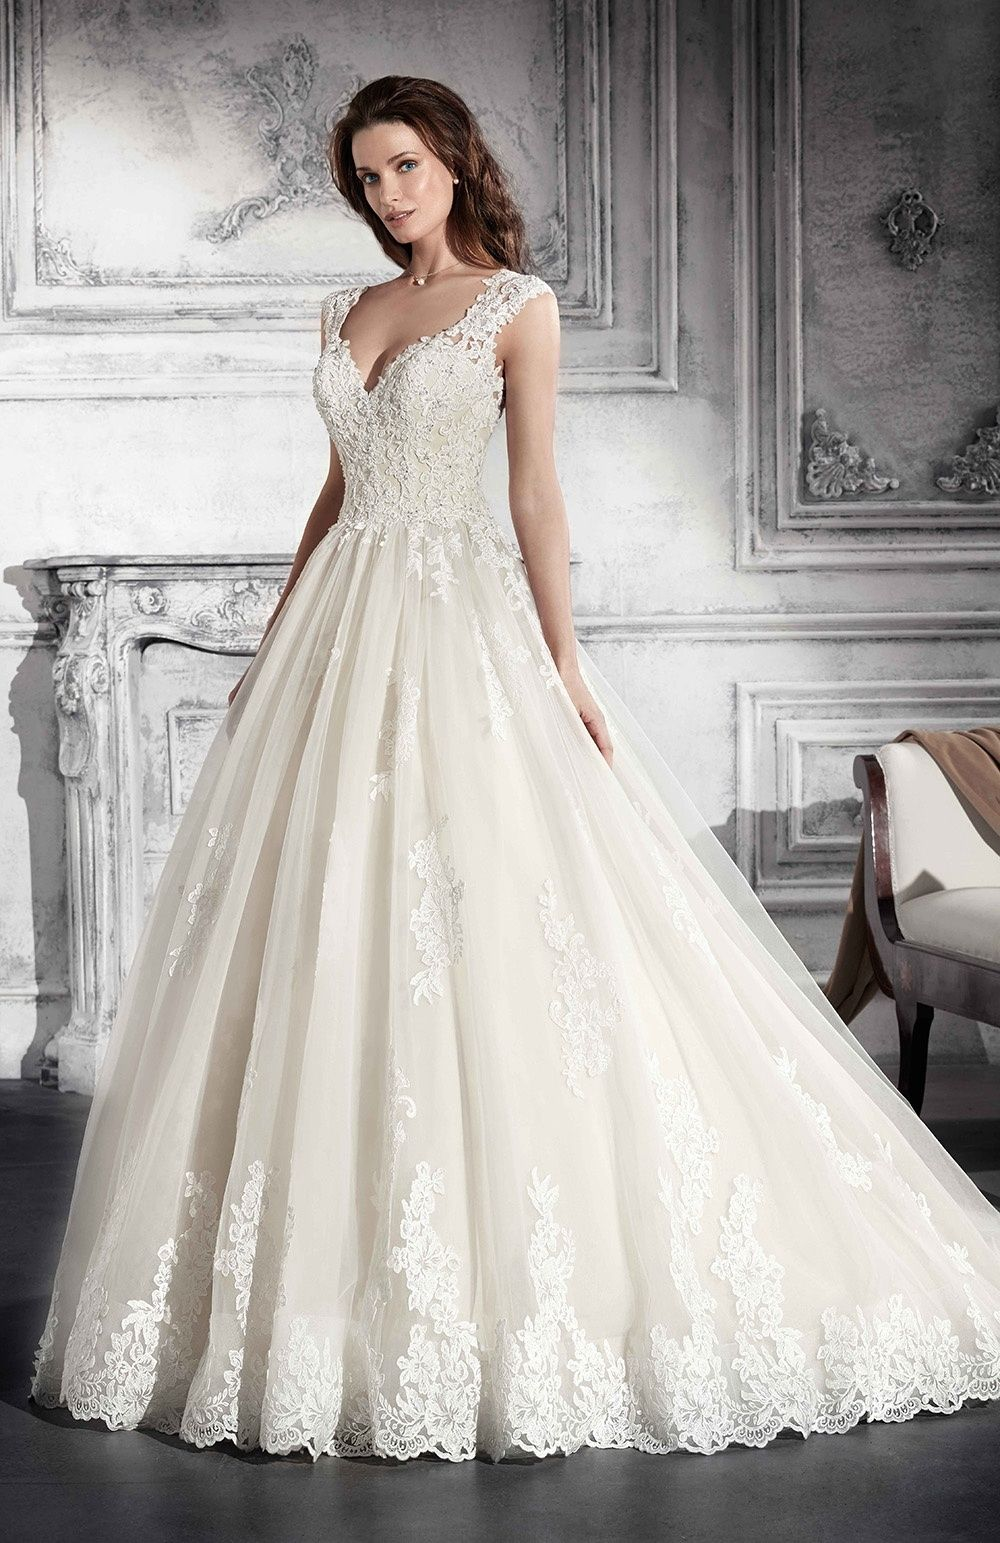 9f9df91495d Robe de mariée Demetrios 2018 Modèle   Νυφικά Φορέματα/ wedding ...